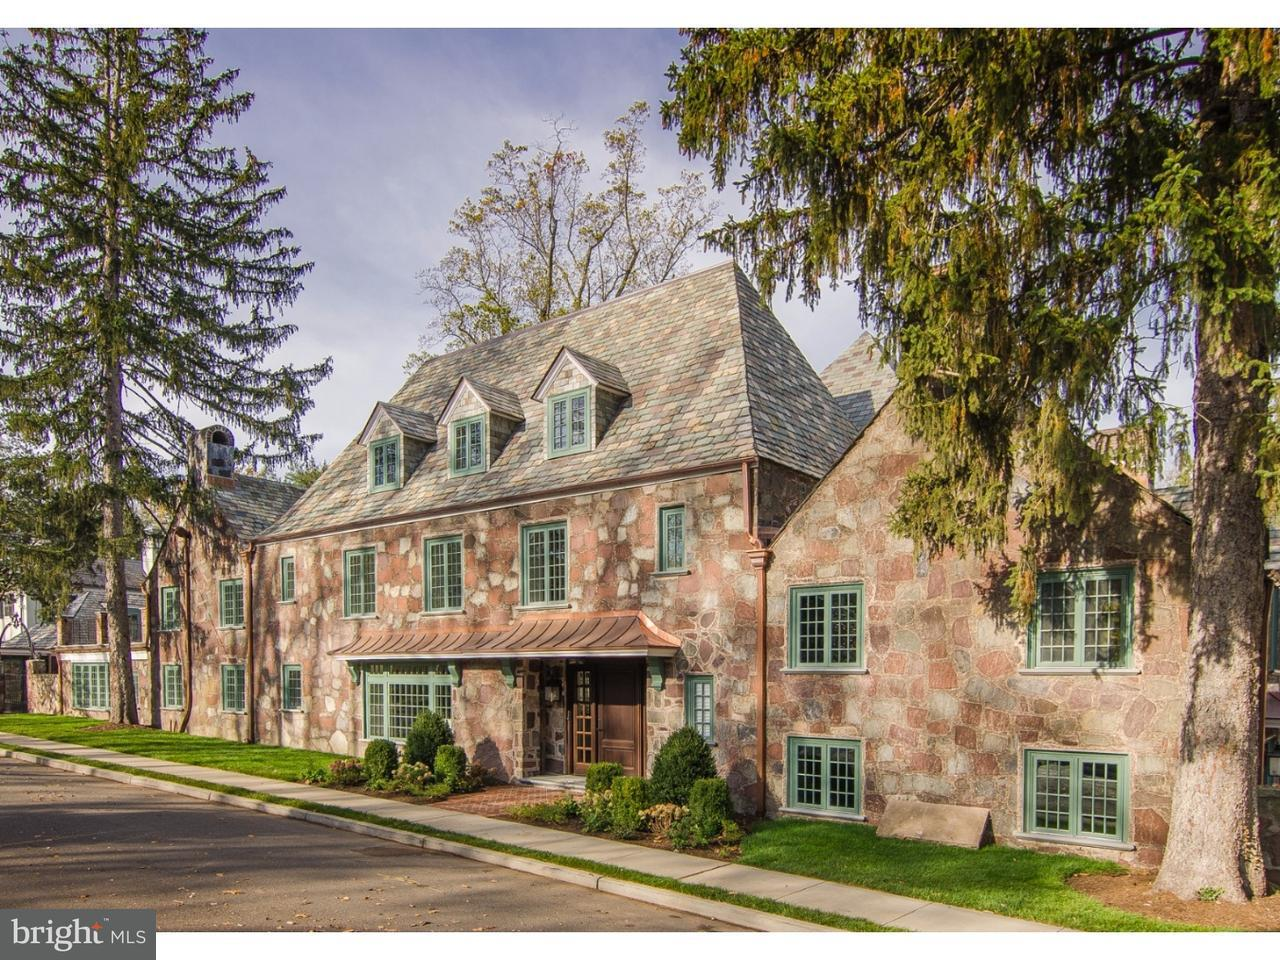 Single Family Home for Sale at 75 CLEVELAND Lane Princeton, New Jersey 08540 United StatesMunicipality: Princeton